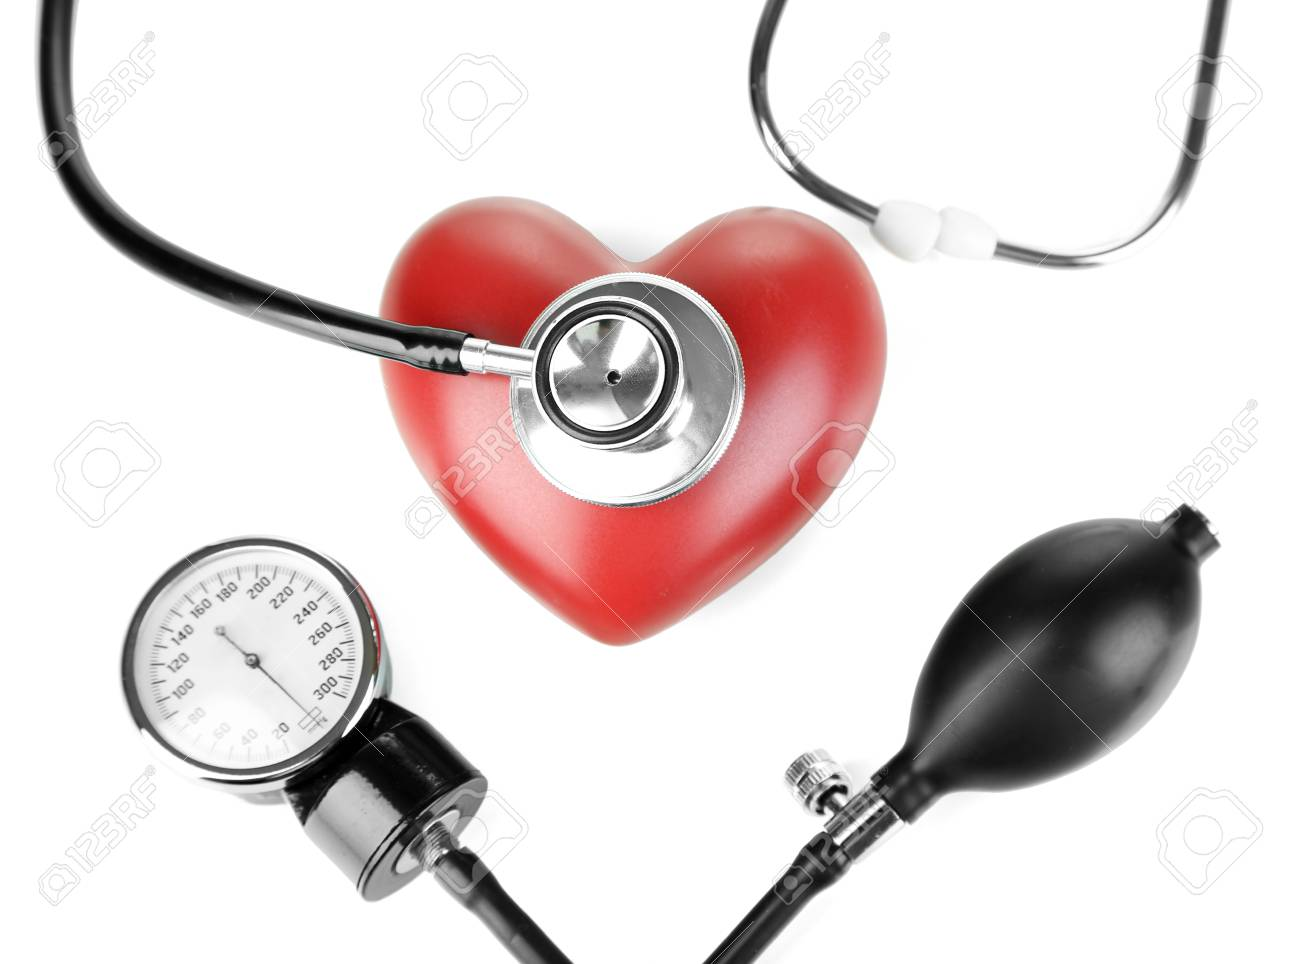 Tonometer, stethoscope and heart isolated on white Stock Photo - 23716407